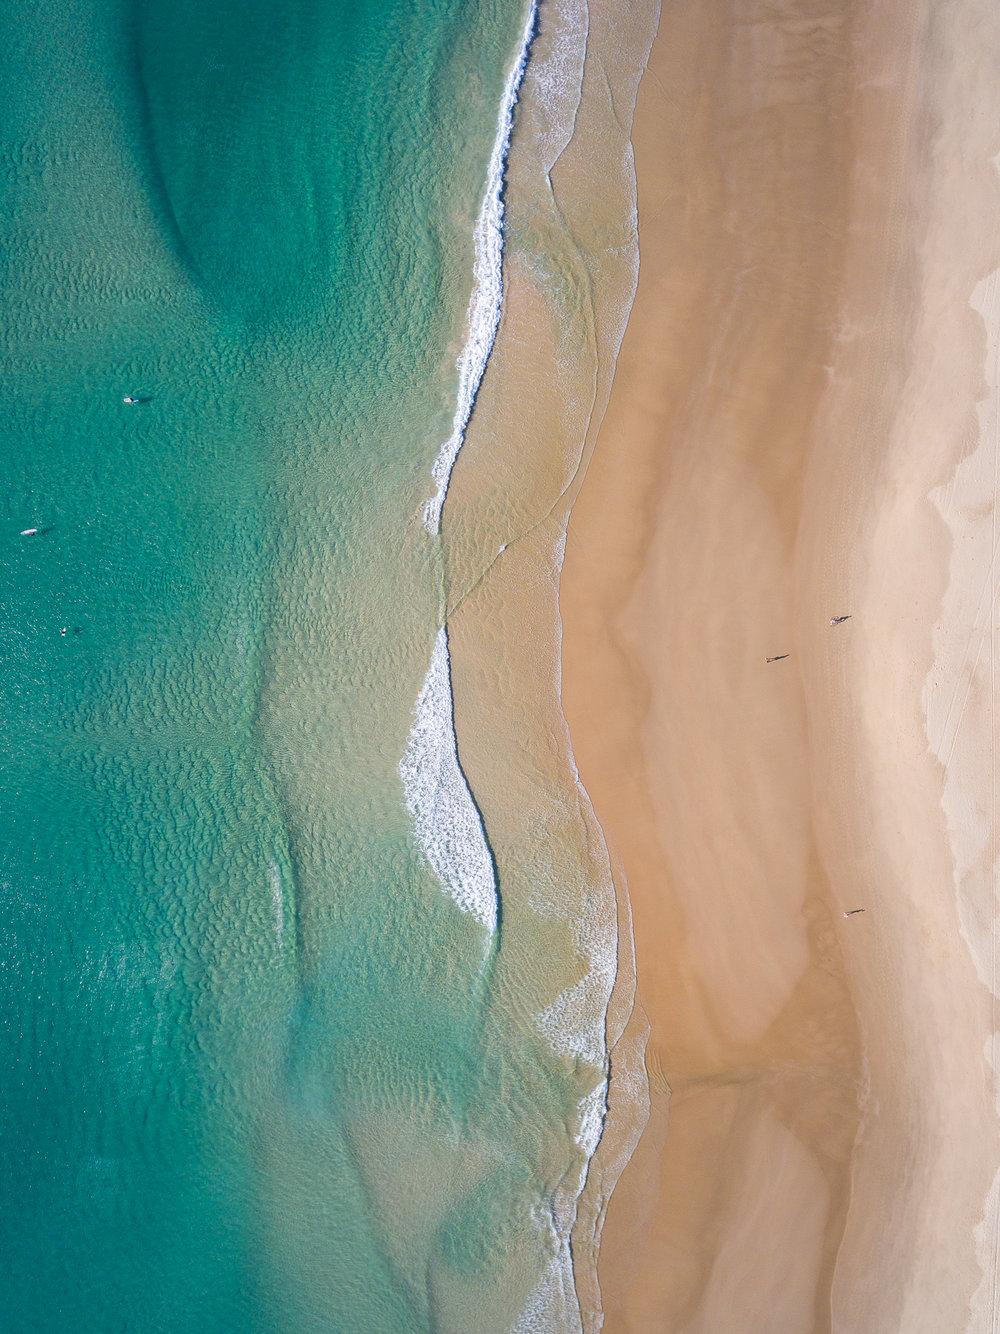 Flying high above Peregian Beach